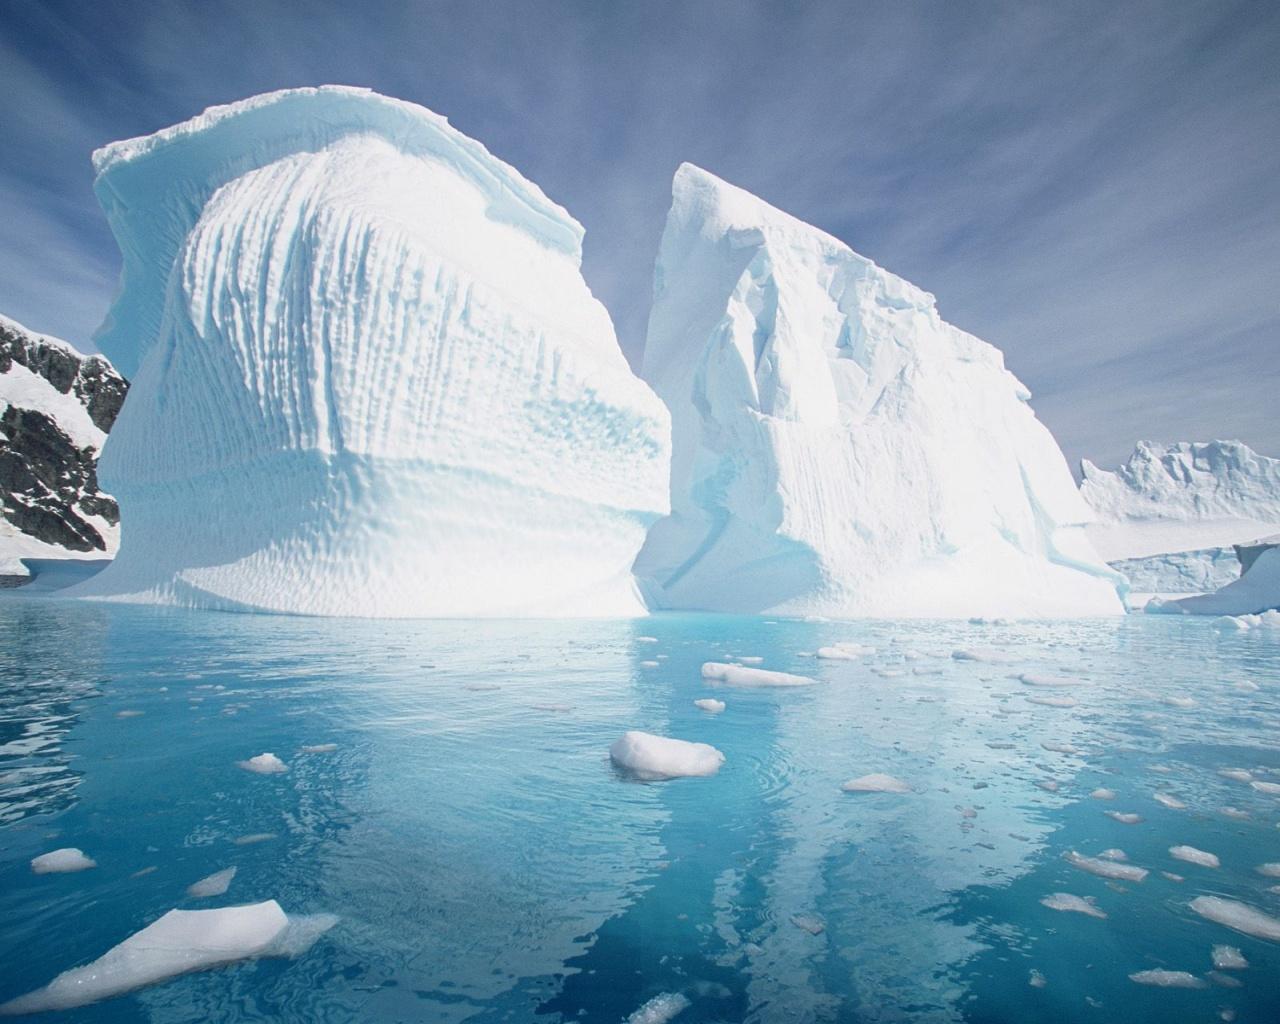 Ice Wallpaper 19671 1280x1024 px